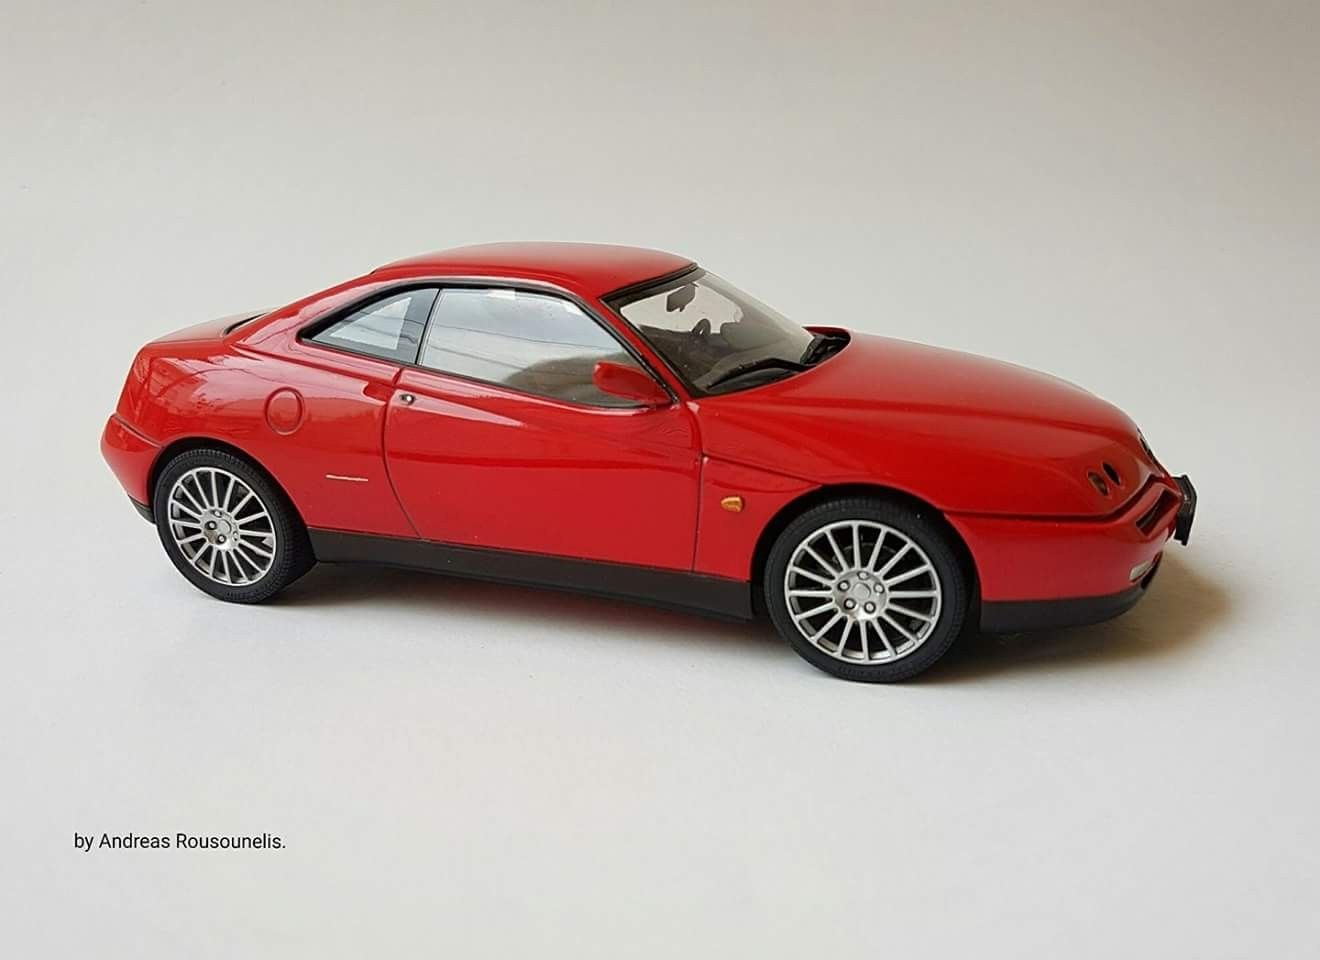 Alfa Romeo gtv Alfa romeo gtv, Alfa romeo, Car model